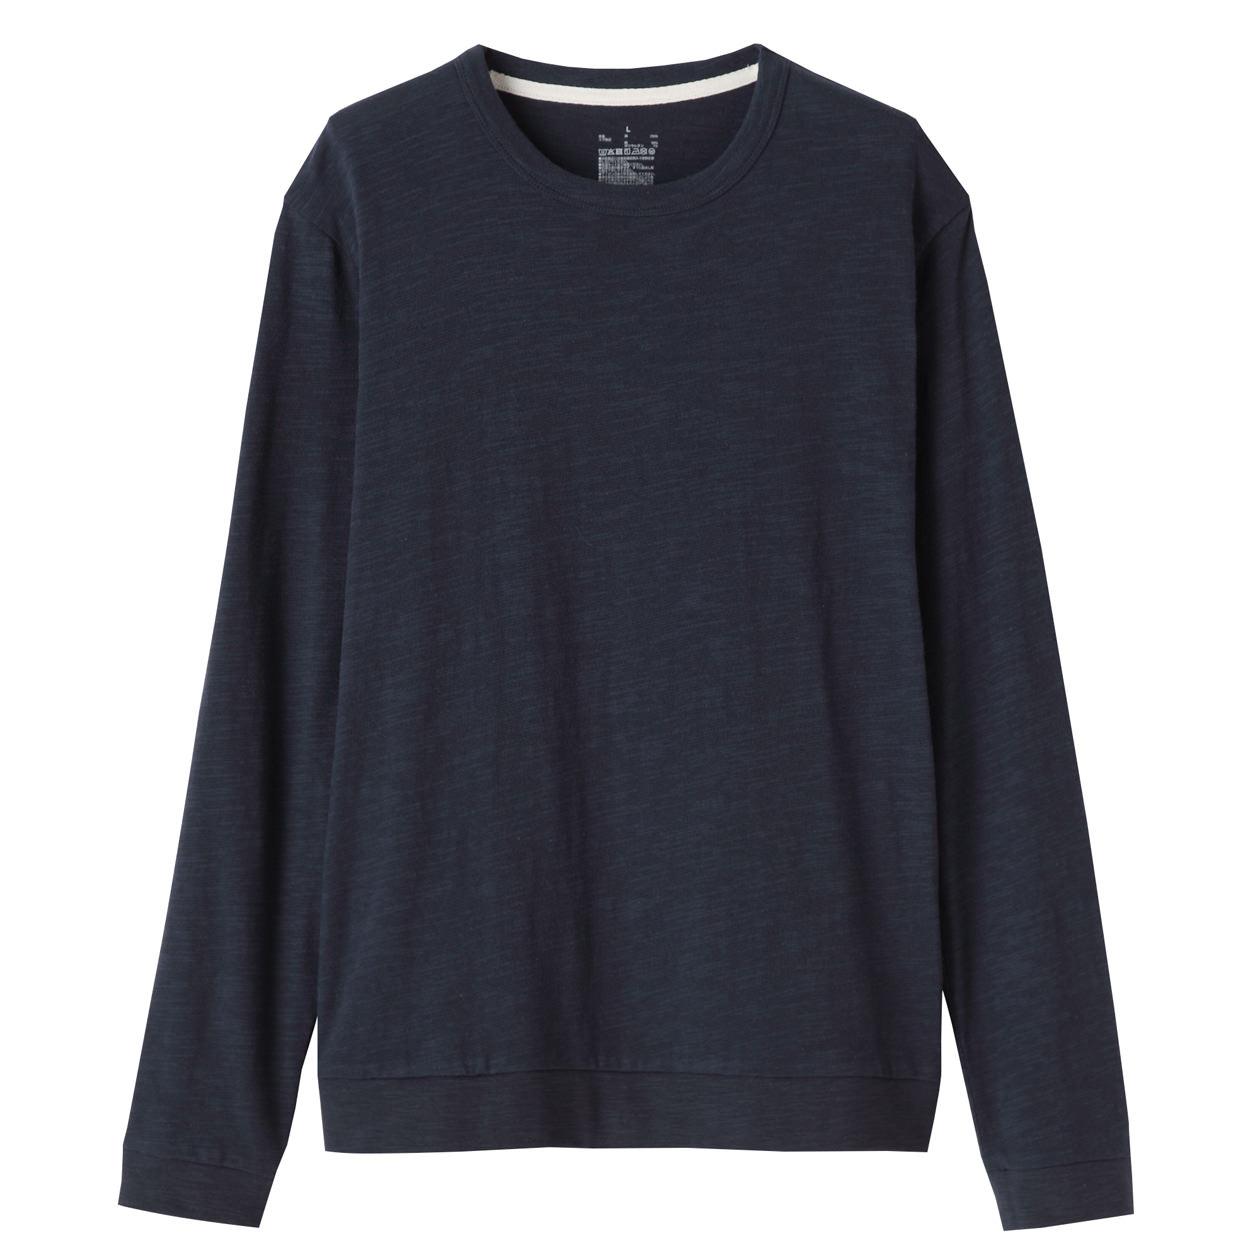 Organic Cotton Long-Sleeve T-shirt, U.P. $19.90-$29 (Any 2 Less 10%)